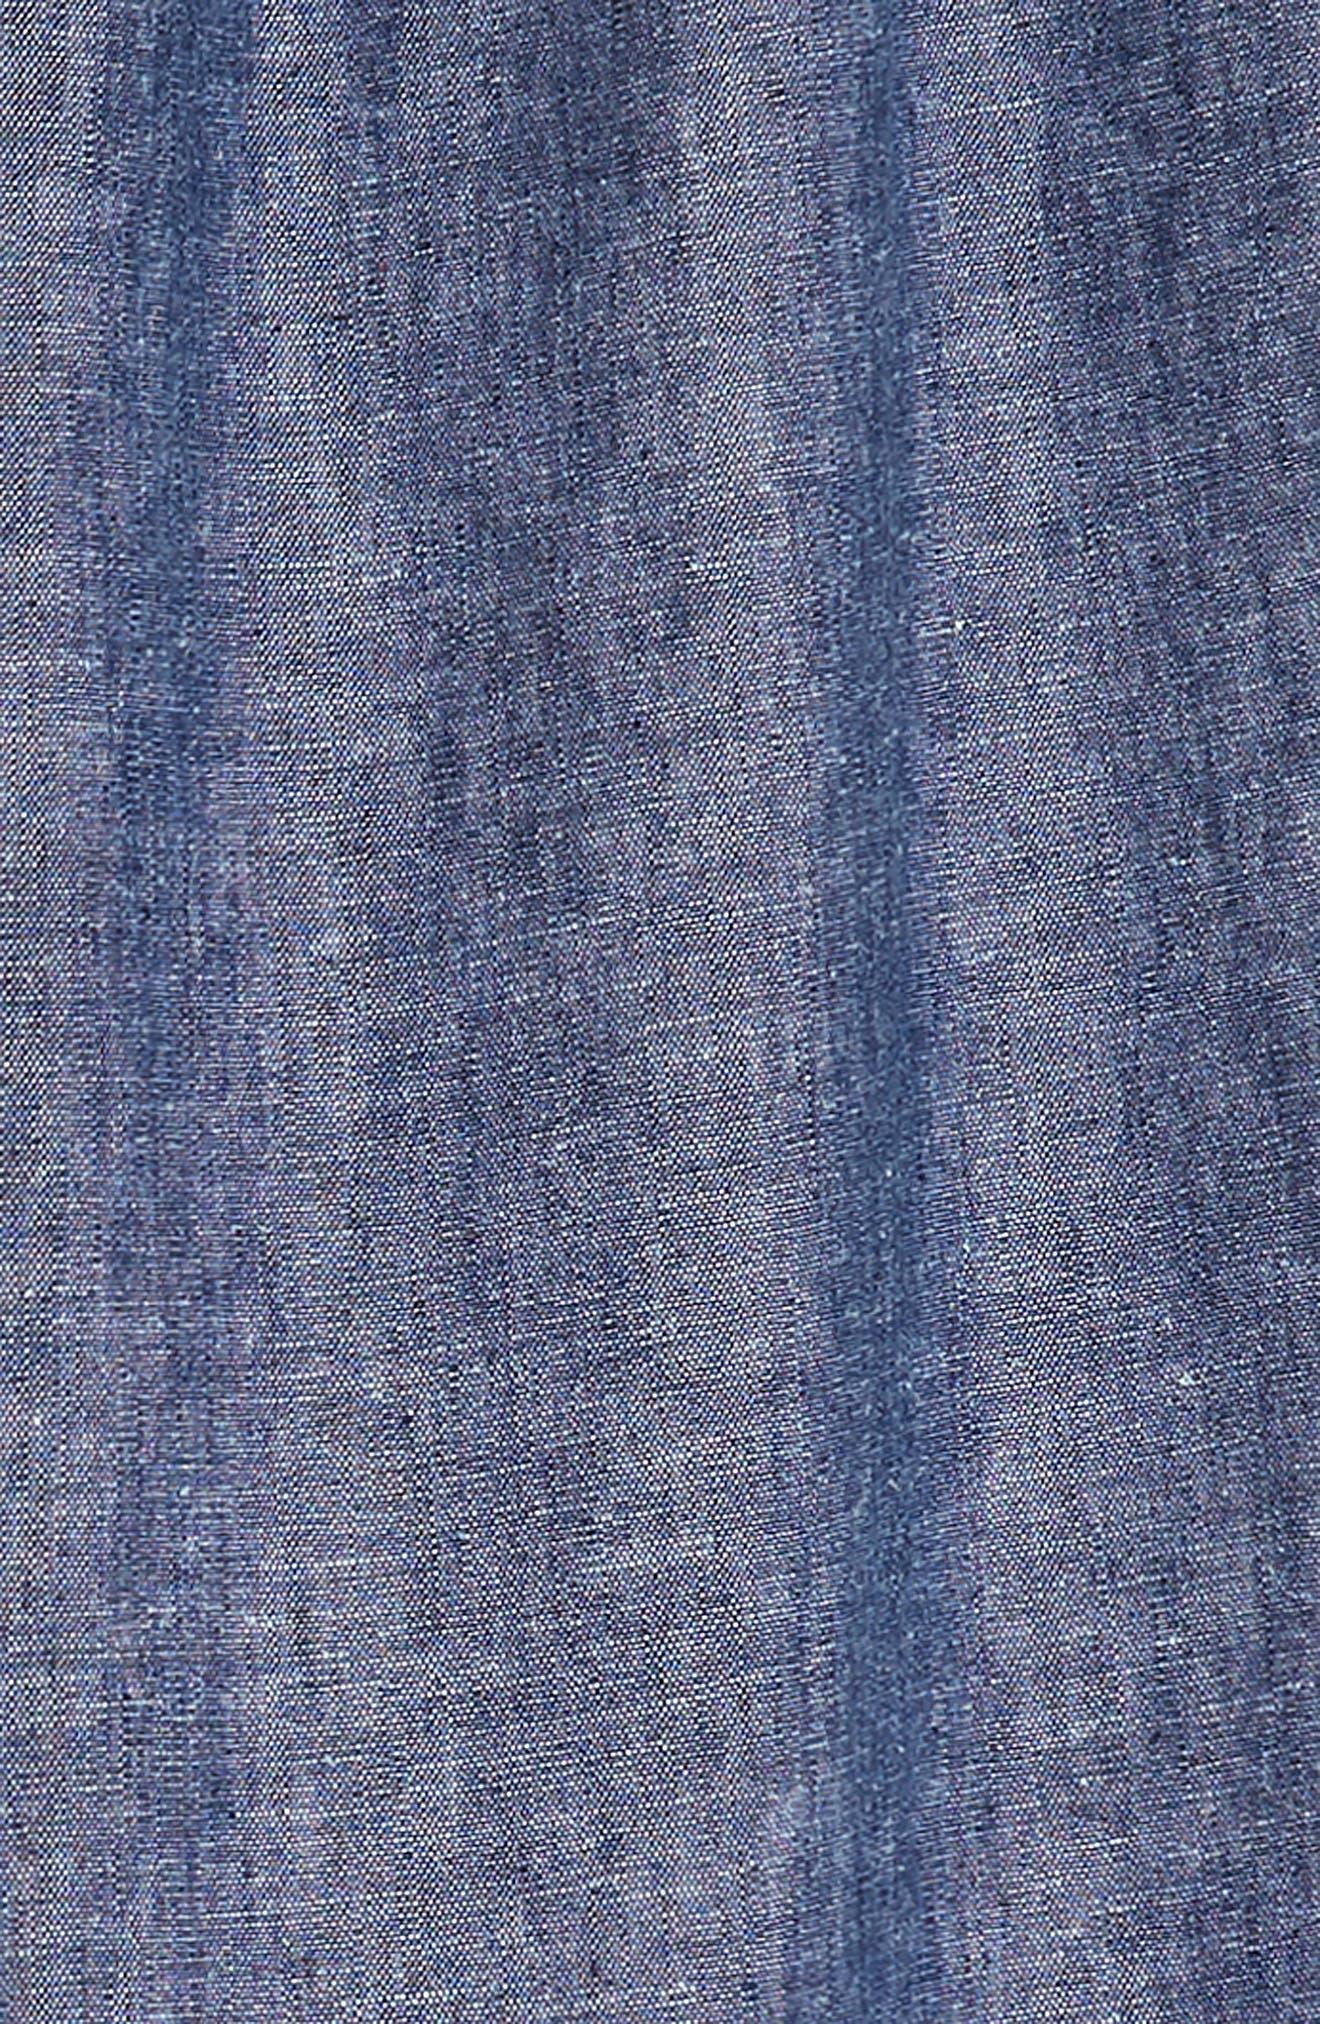 Chambray Ruffle Neck Dress,                             Alternate thumbnail 3, color,                             411